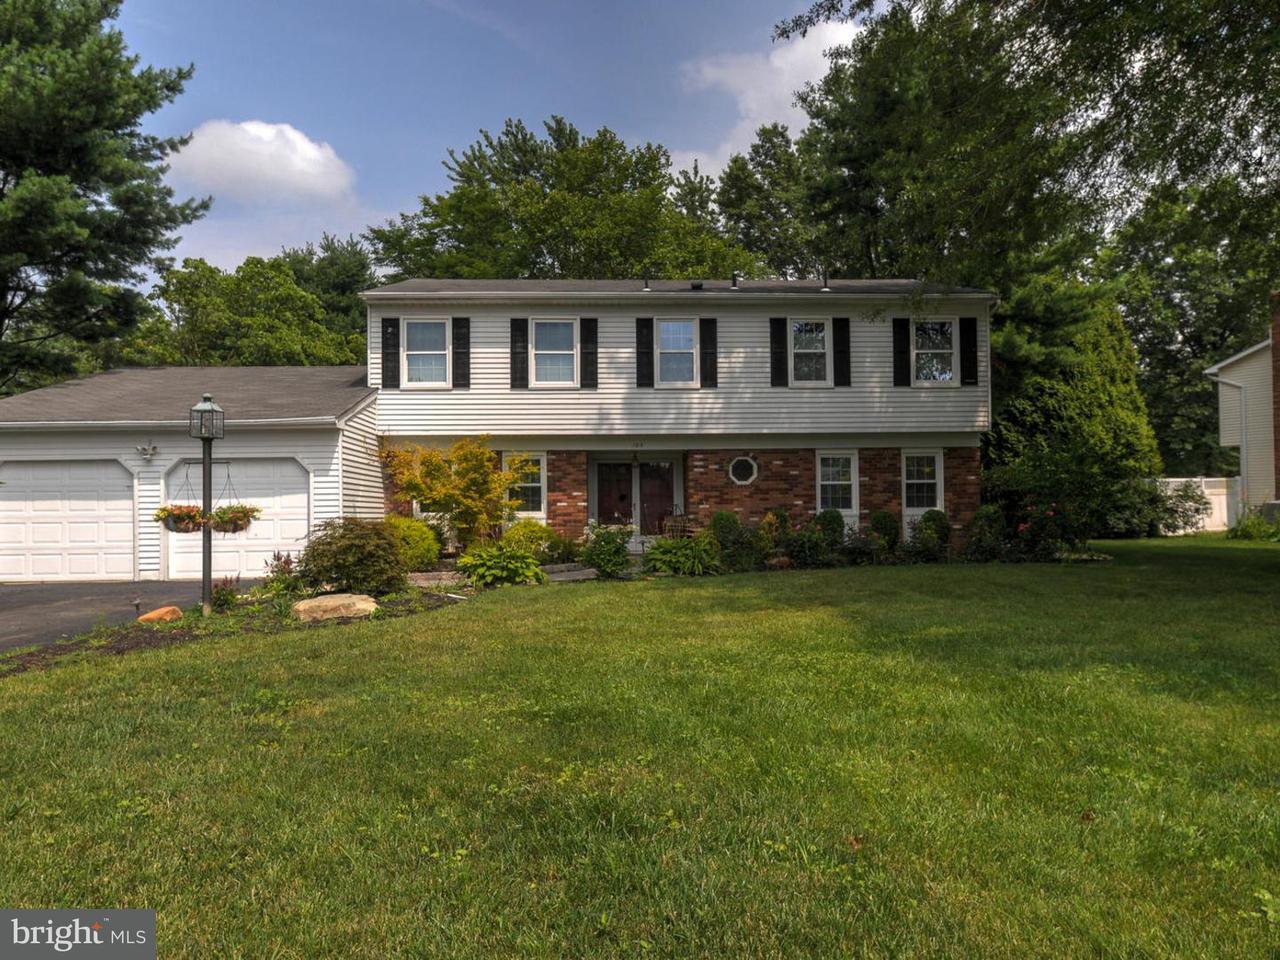 Casa Unifamiliar por un Alquiler en 125 PARKER RD S Plainsboro, Nueva Jersey 08536 Estados UnidosEn/Alrededor: Plainsboro Township